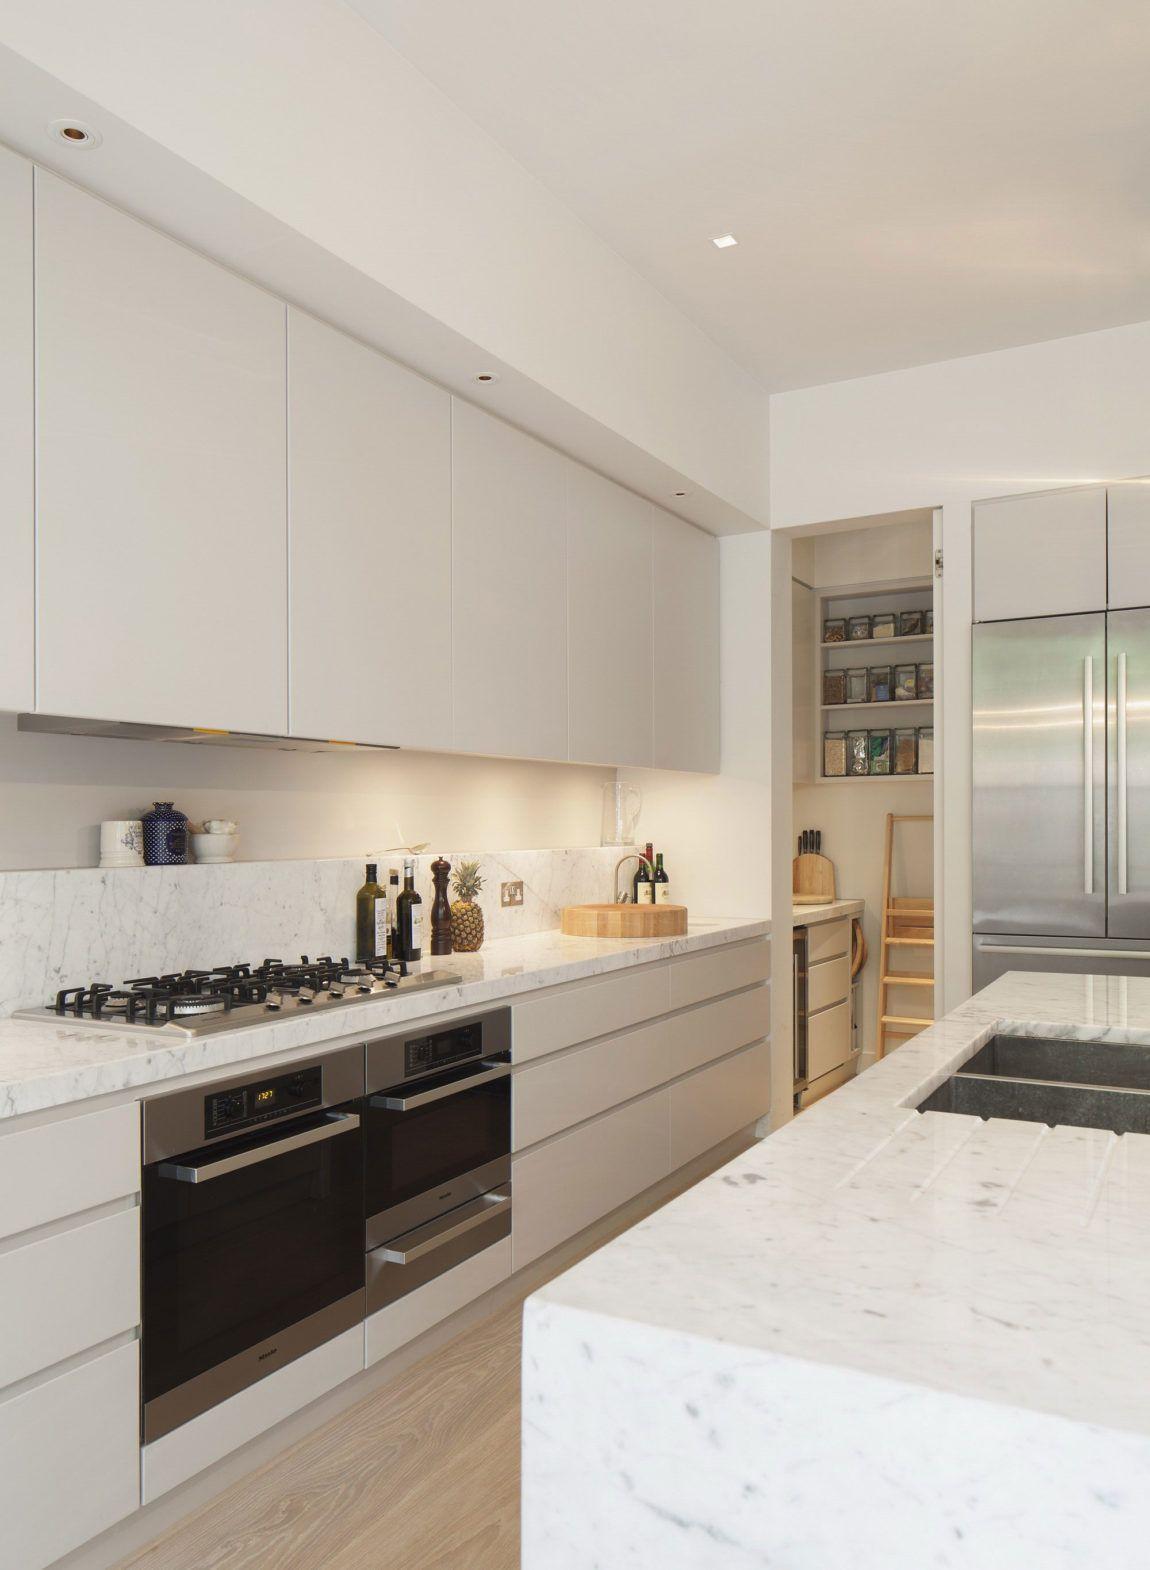 Hurlingham Road by De Rosee Sa | Kitchen | Pinterest | Kitchens ...